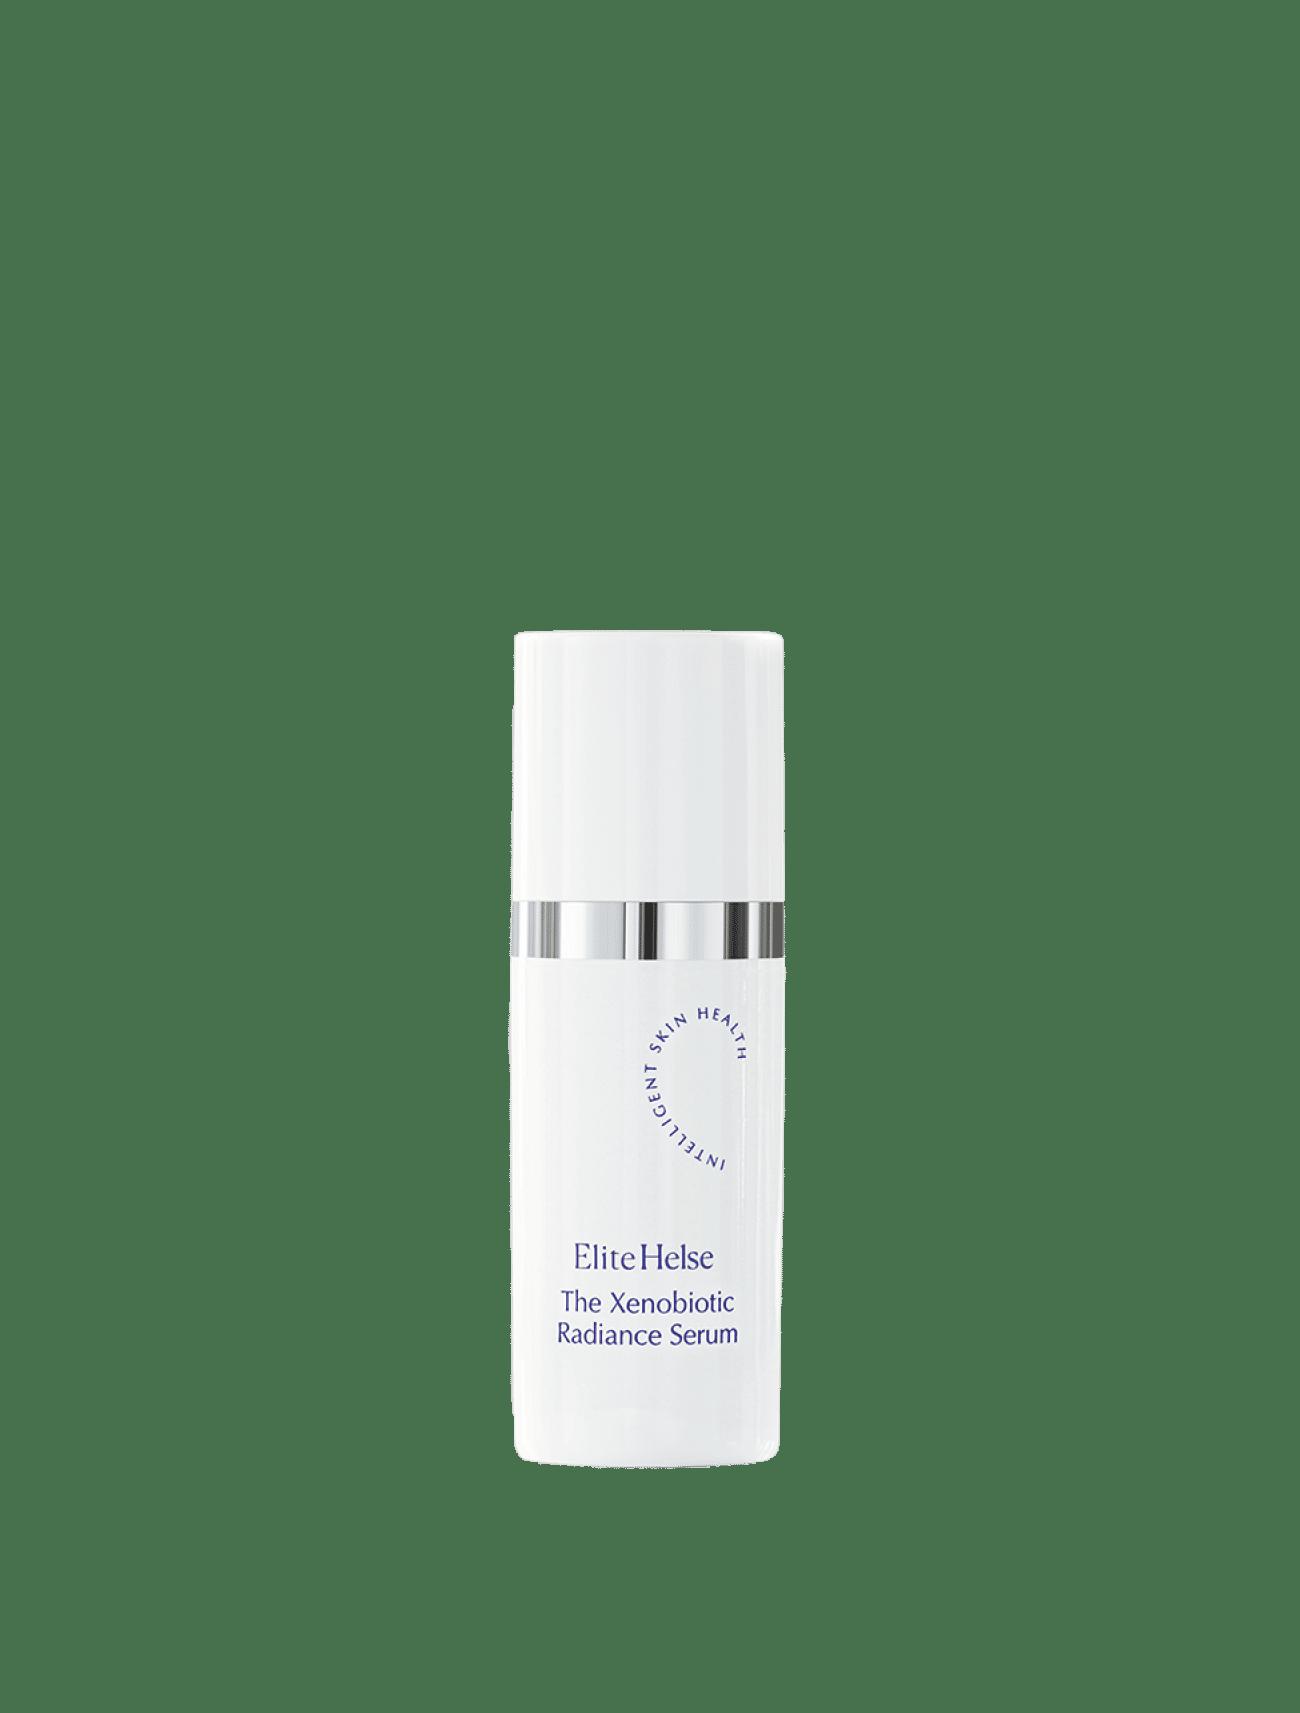 The Xenibiotic Radiance Serum